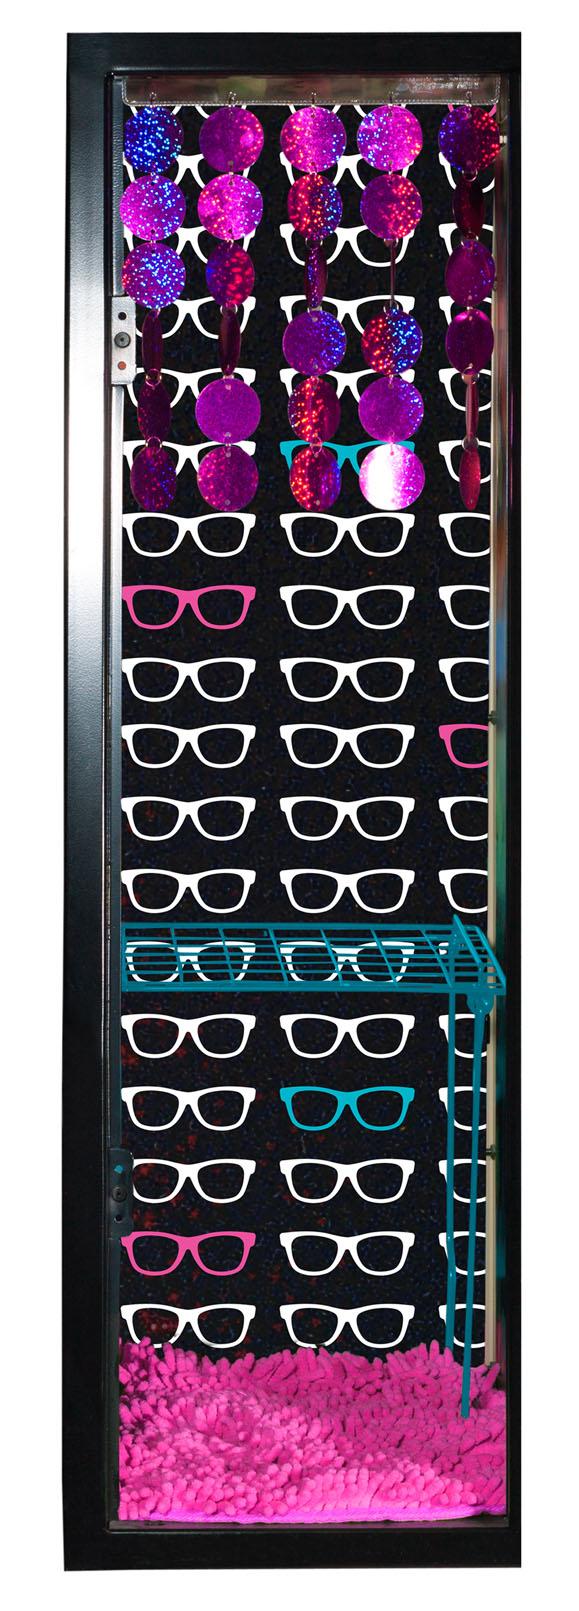 Lockers 101 Wallpaper Set Your school locker has never looked this 579x1611